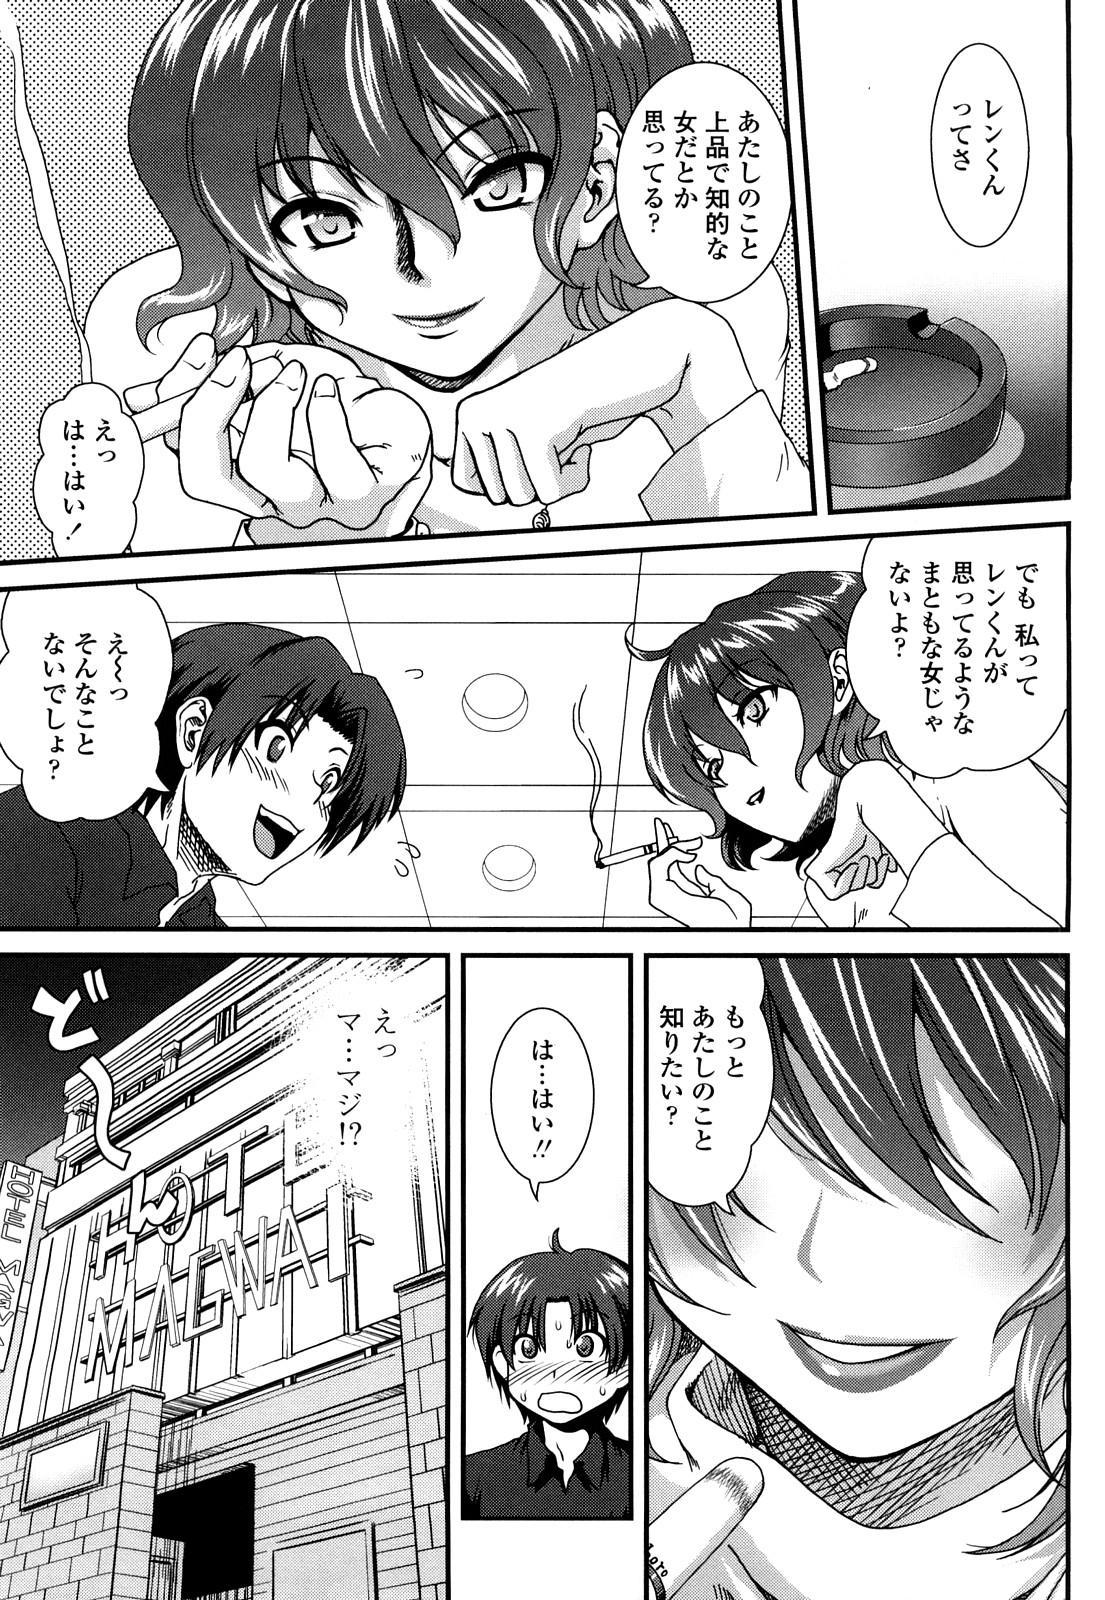 Ichigo Marble 11